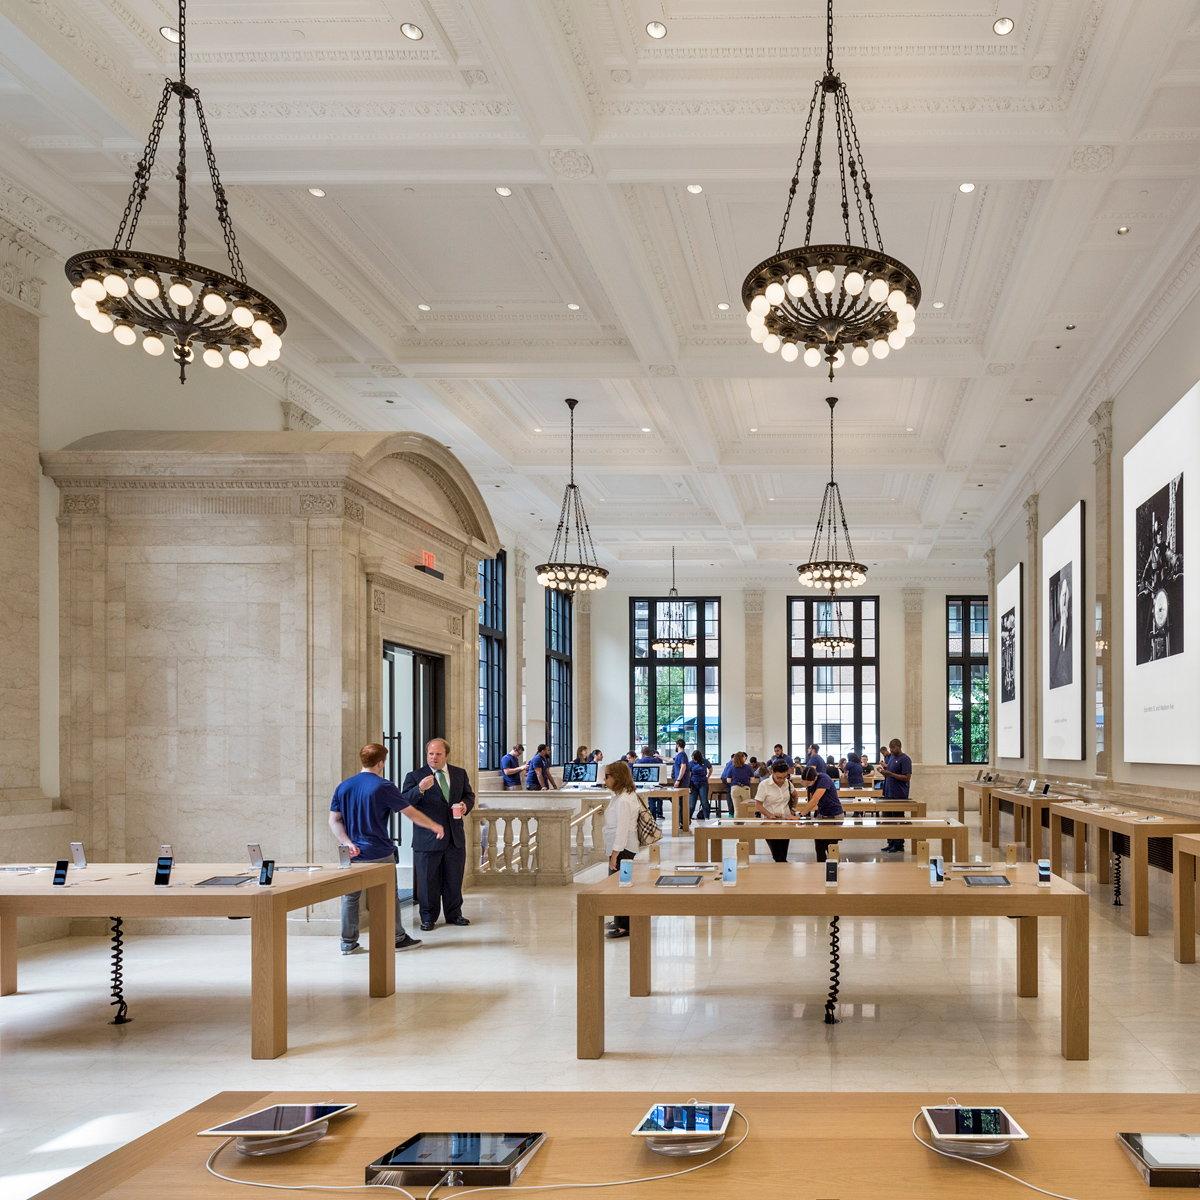 Bohlin cywinski jackson receives special commendation for apple store upper east side